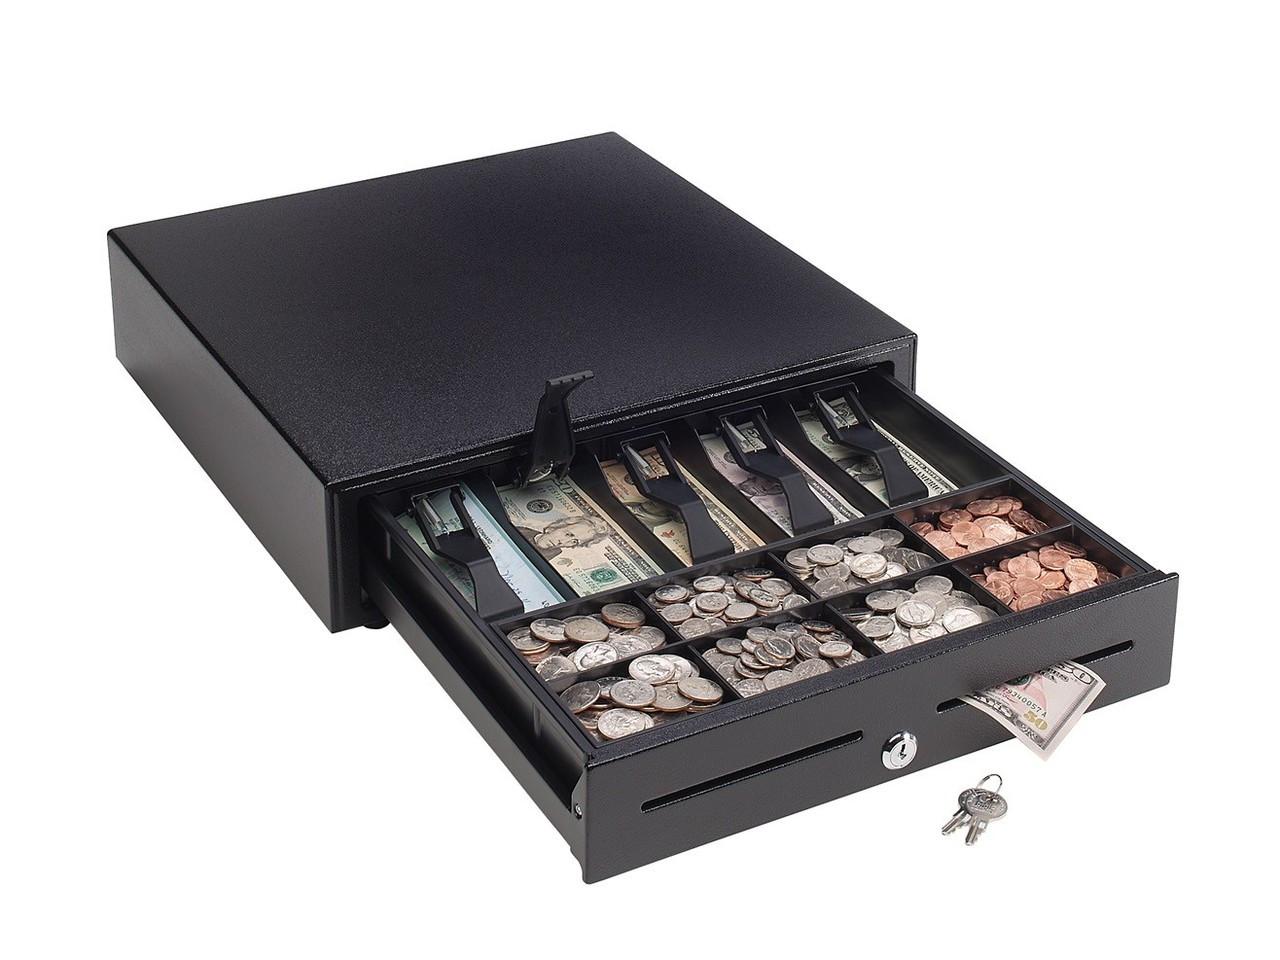 MMF VAL-u Line Series POS Cash Darwer